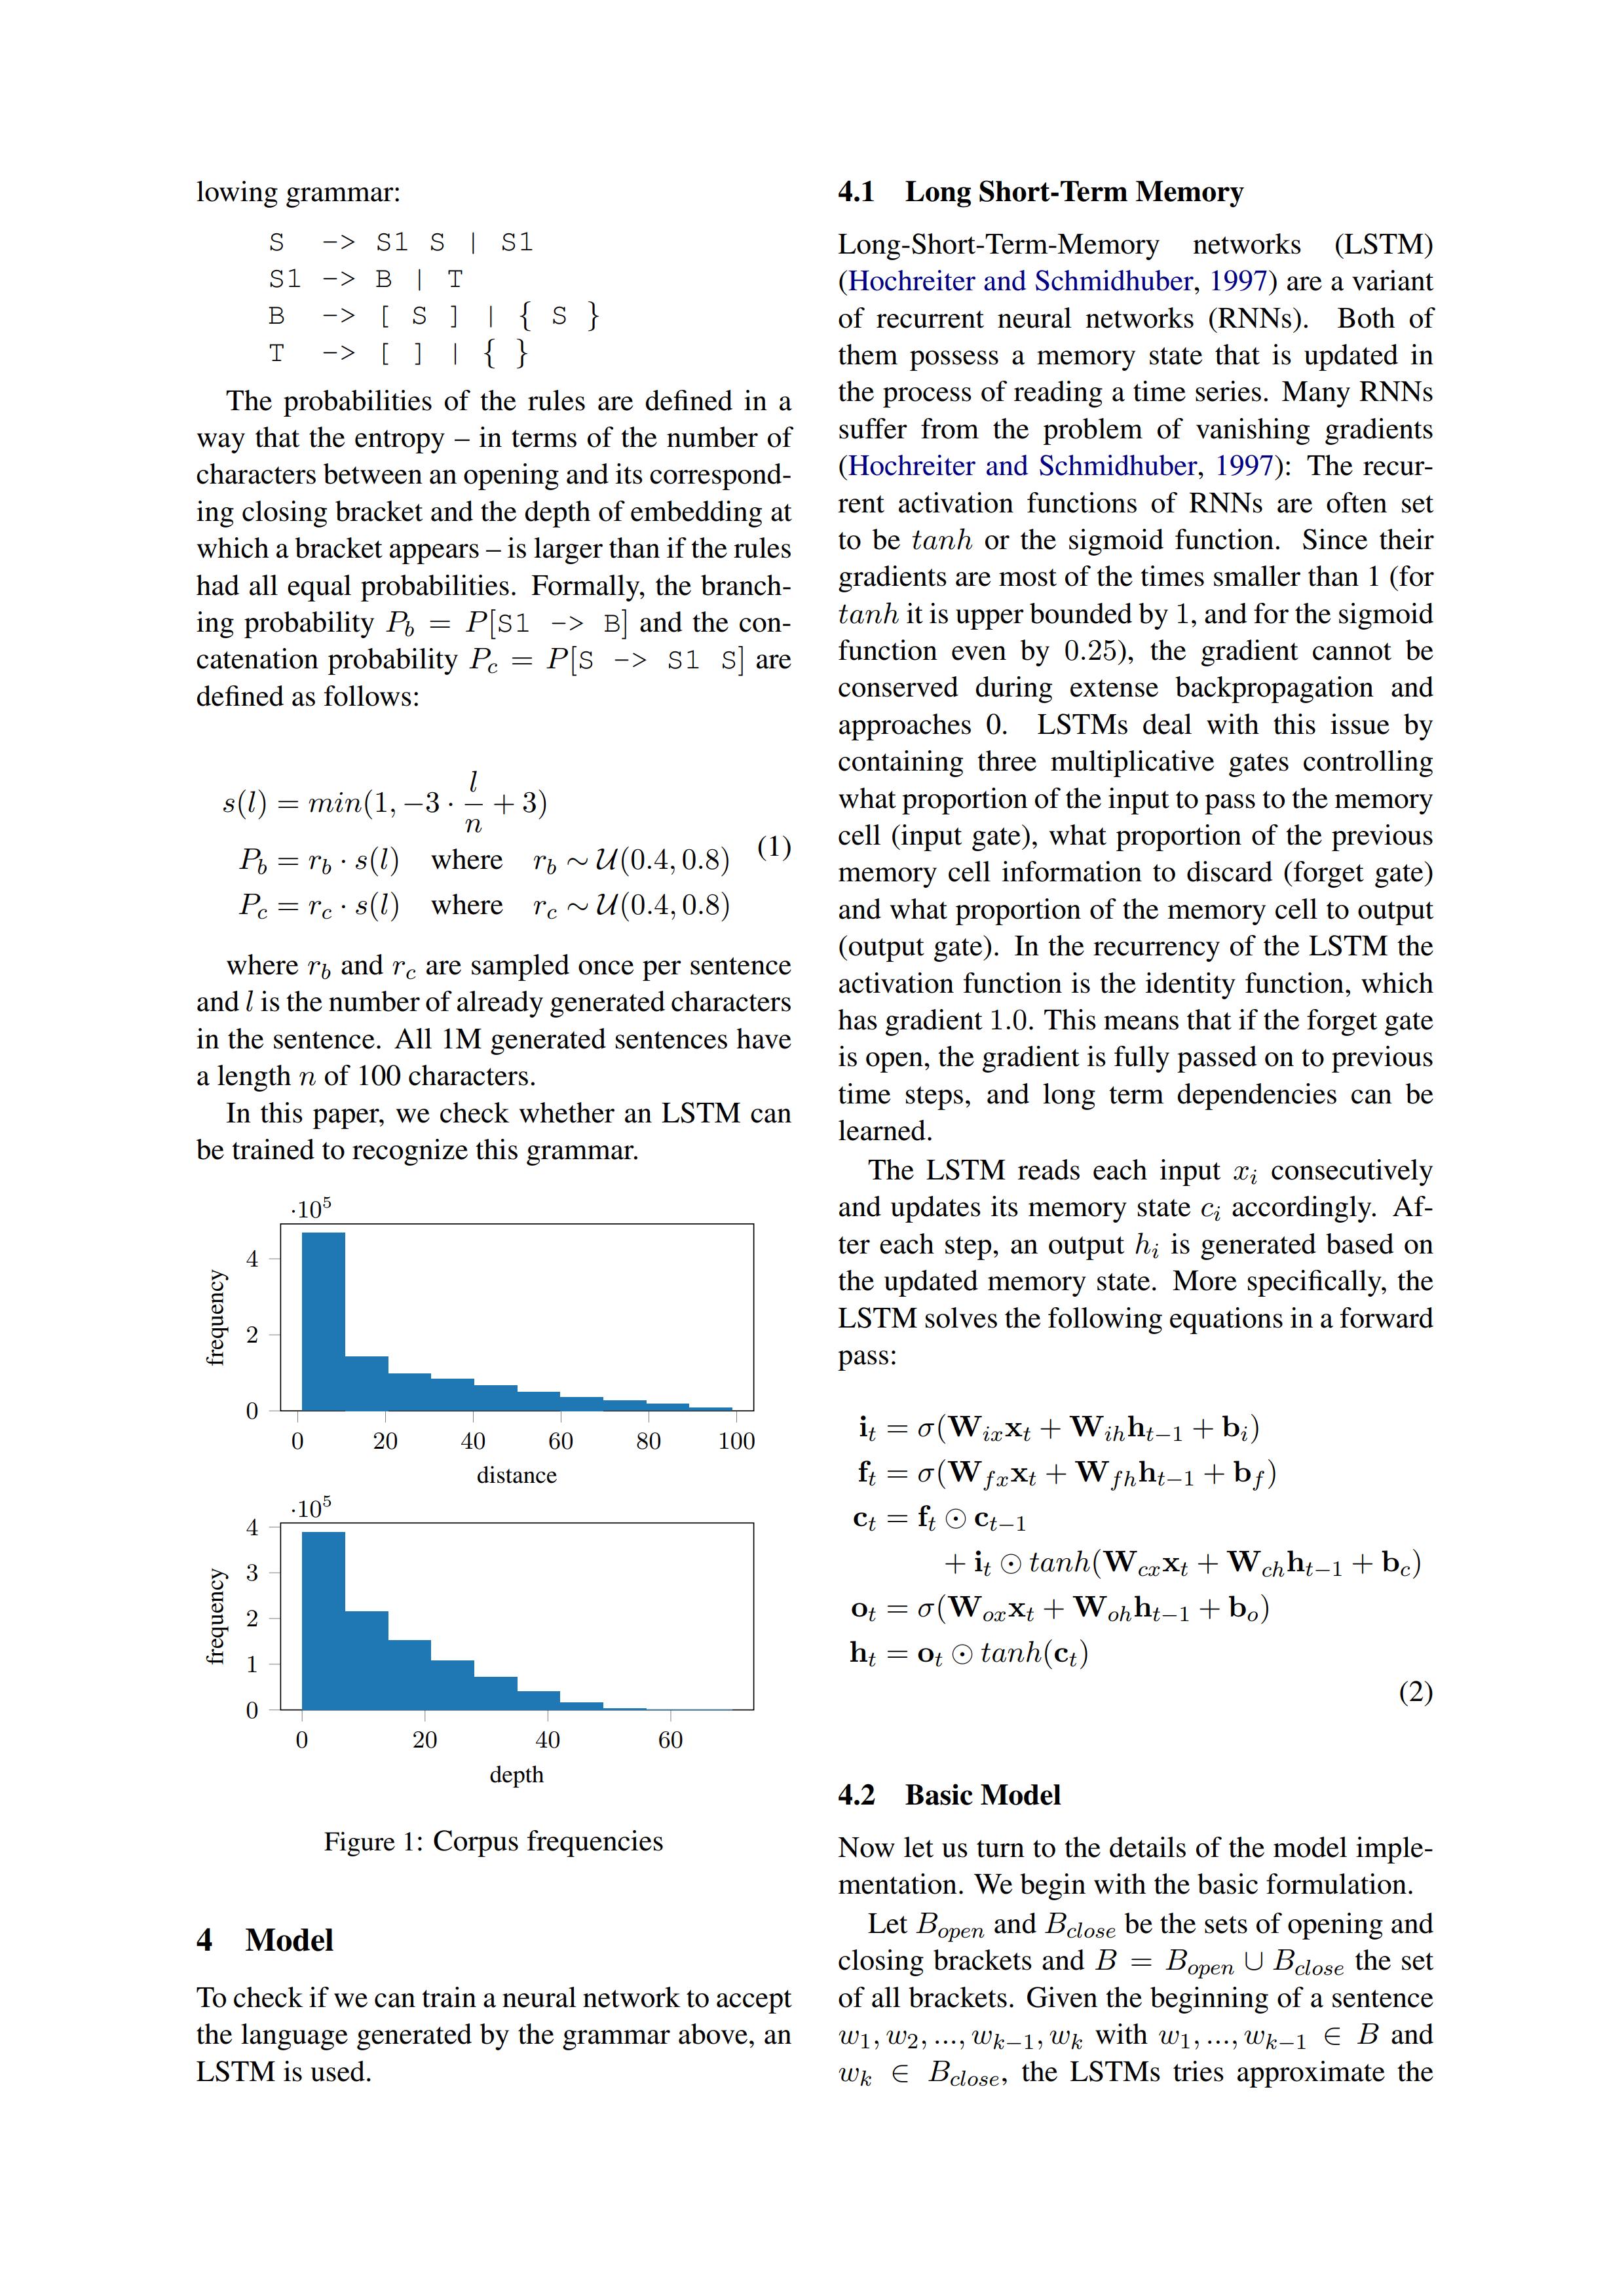 LaTeX 排版的论文 - 评估 LSTM 学习上下文无关语法的能力 - 配图全是 TikZ 完成